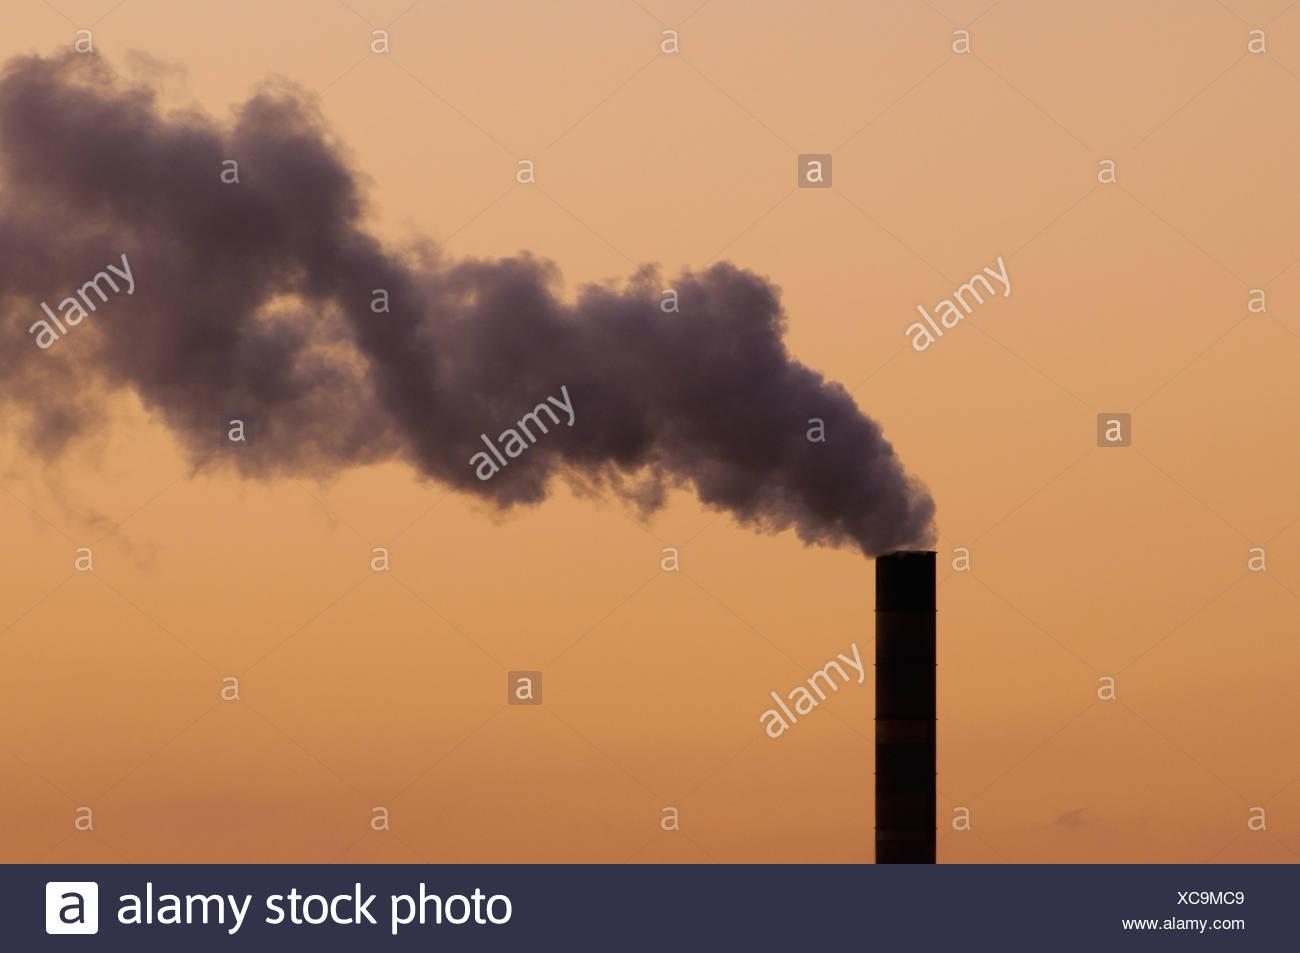 Fernandina Beach Florida USA dicke Wolke von Rauch betriebenen Kohlekraftwerk Stockbild